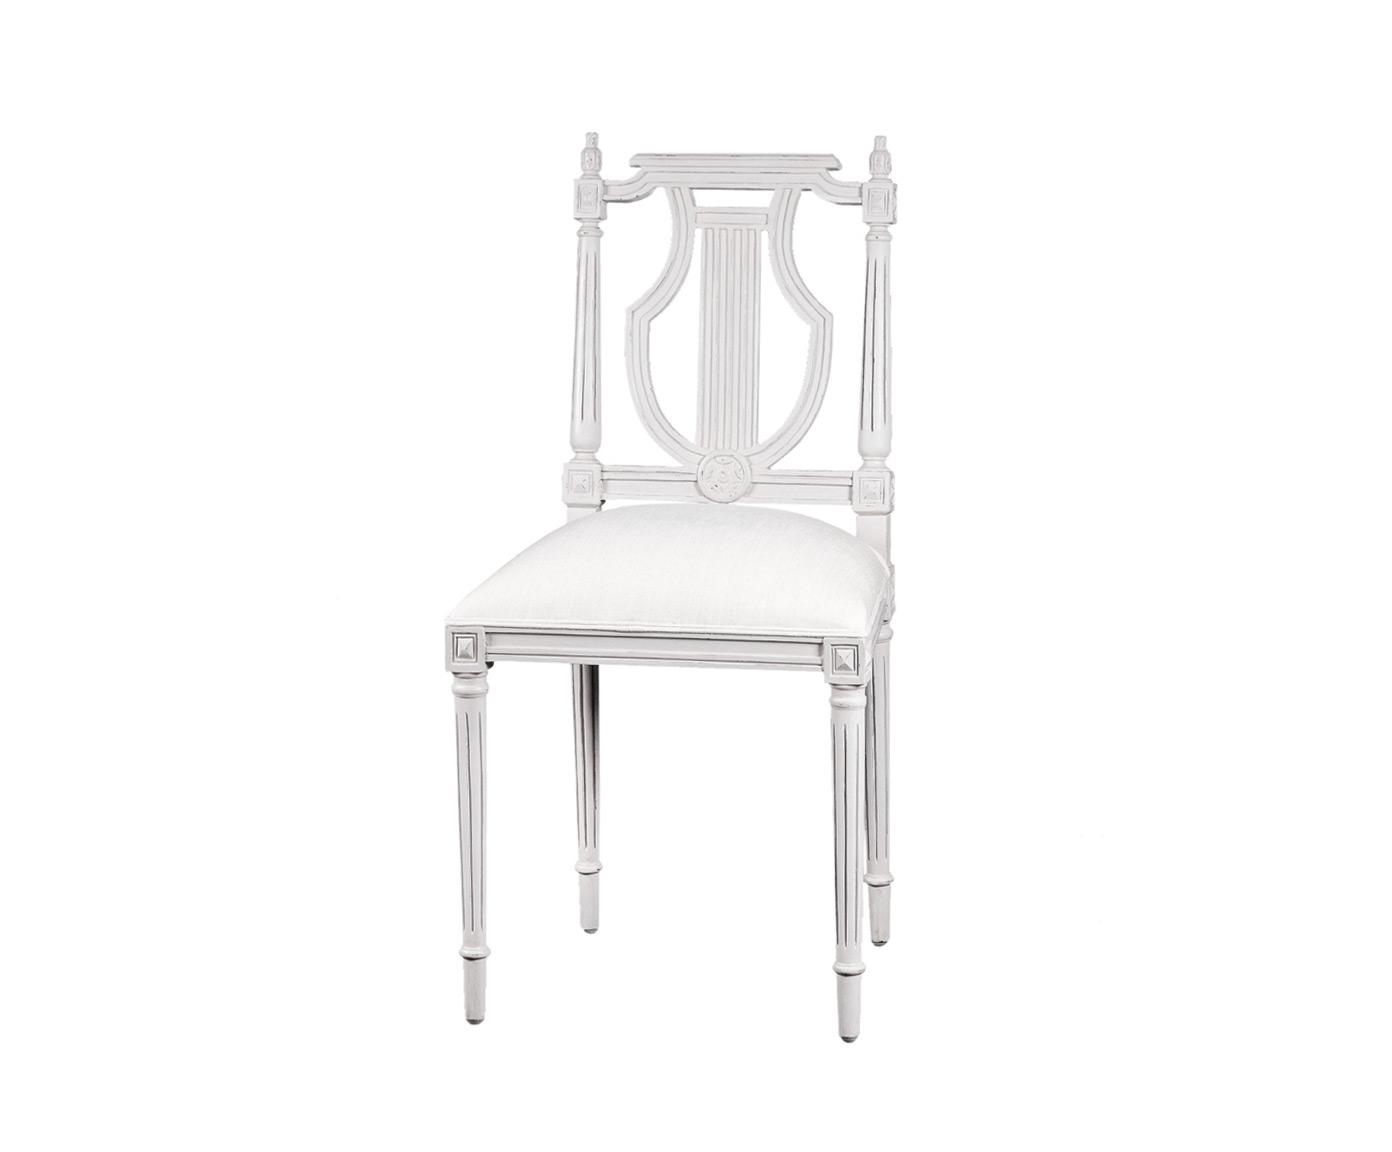 Стул ФранкеттОбеденные стулья<br><br><br>Material: Текстиль<br>Length см: 46.0<br>Width см: 48.0<br>Depth см: None<br>Height см: 93.0<br>Diameter см: None